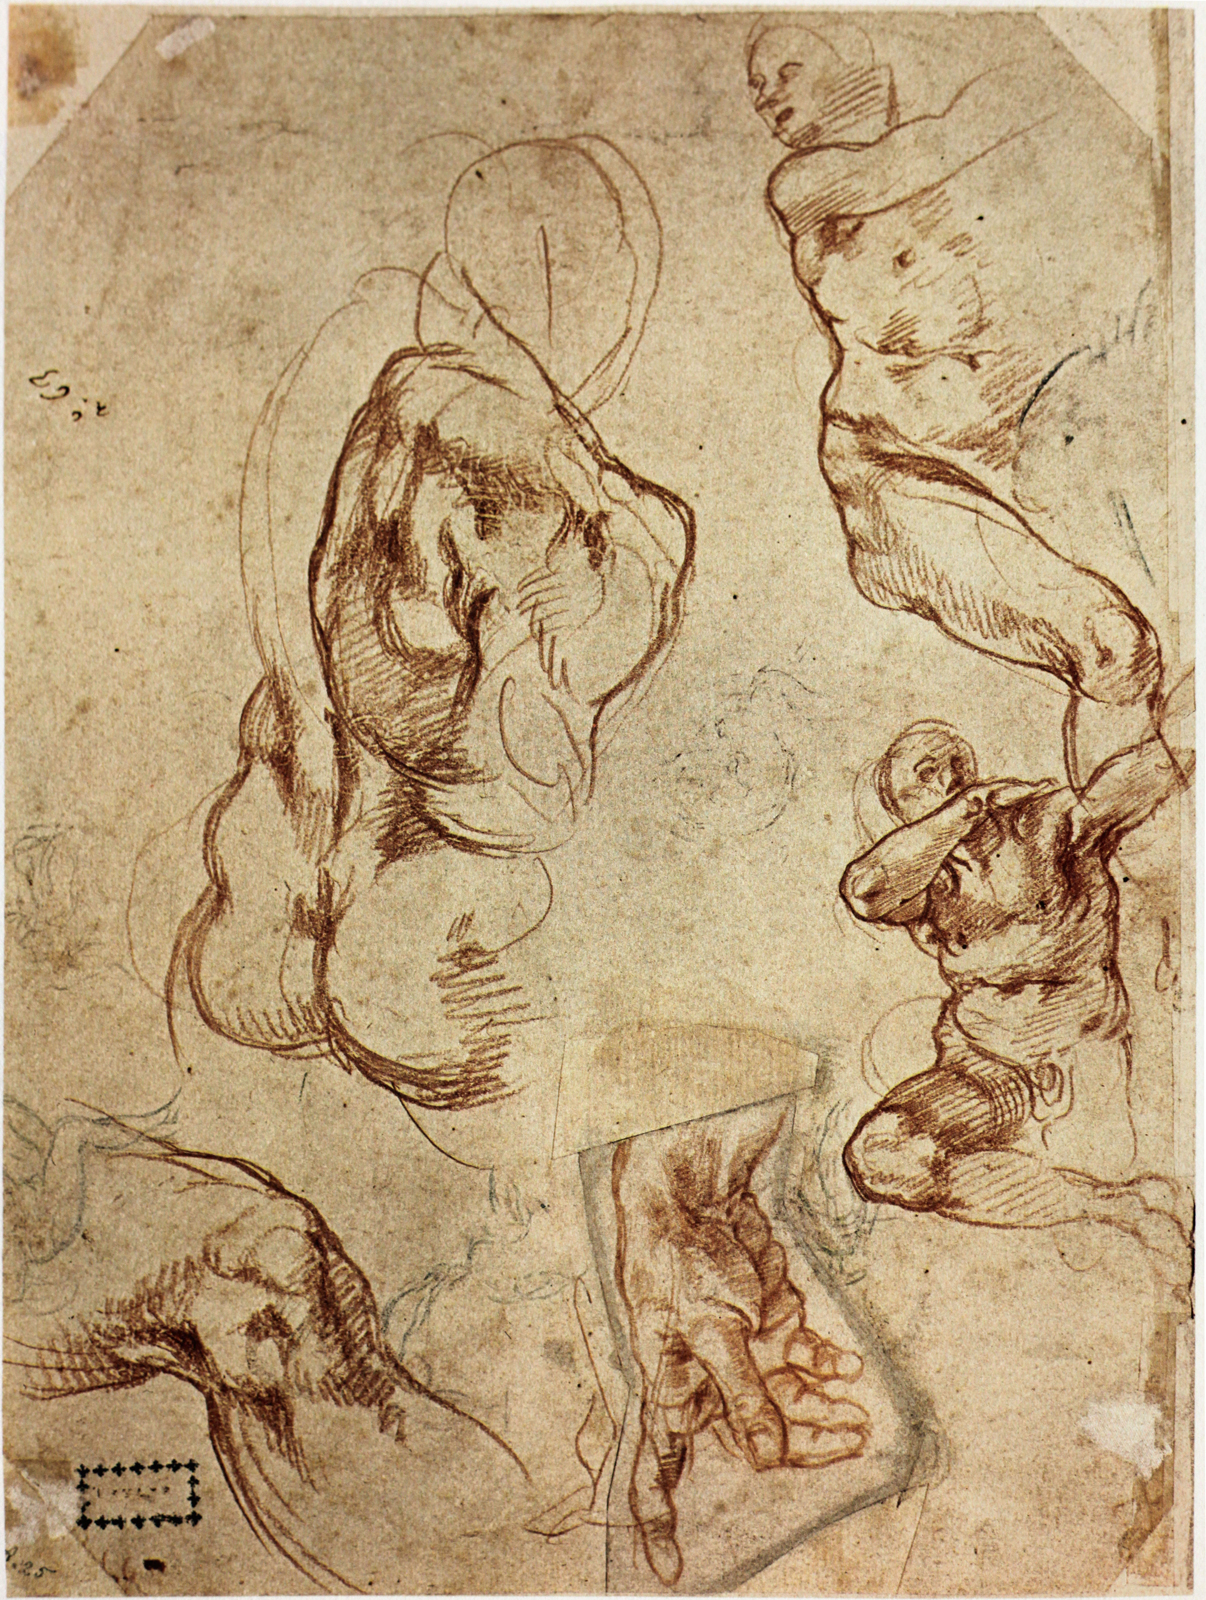 Man\'s head (Ignudo) and figure studies, Michelangelo Buonarroti ...